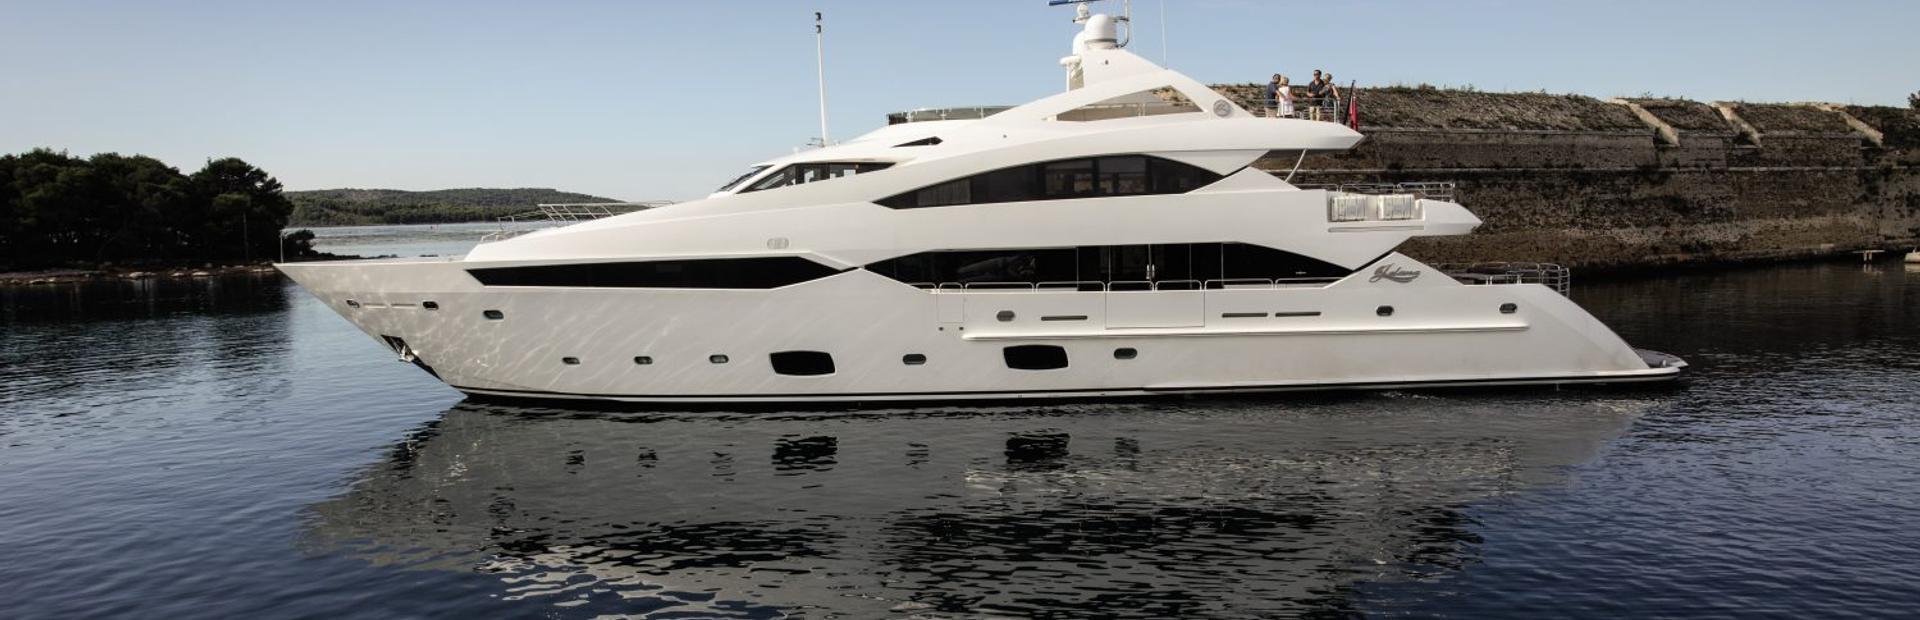 40 Metre Yacht Yacht Charter